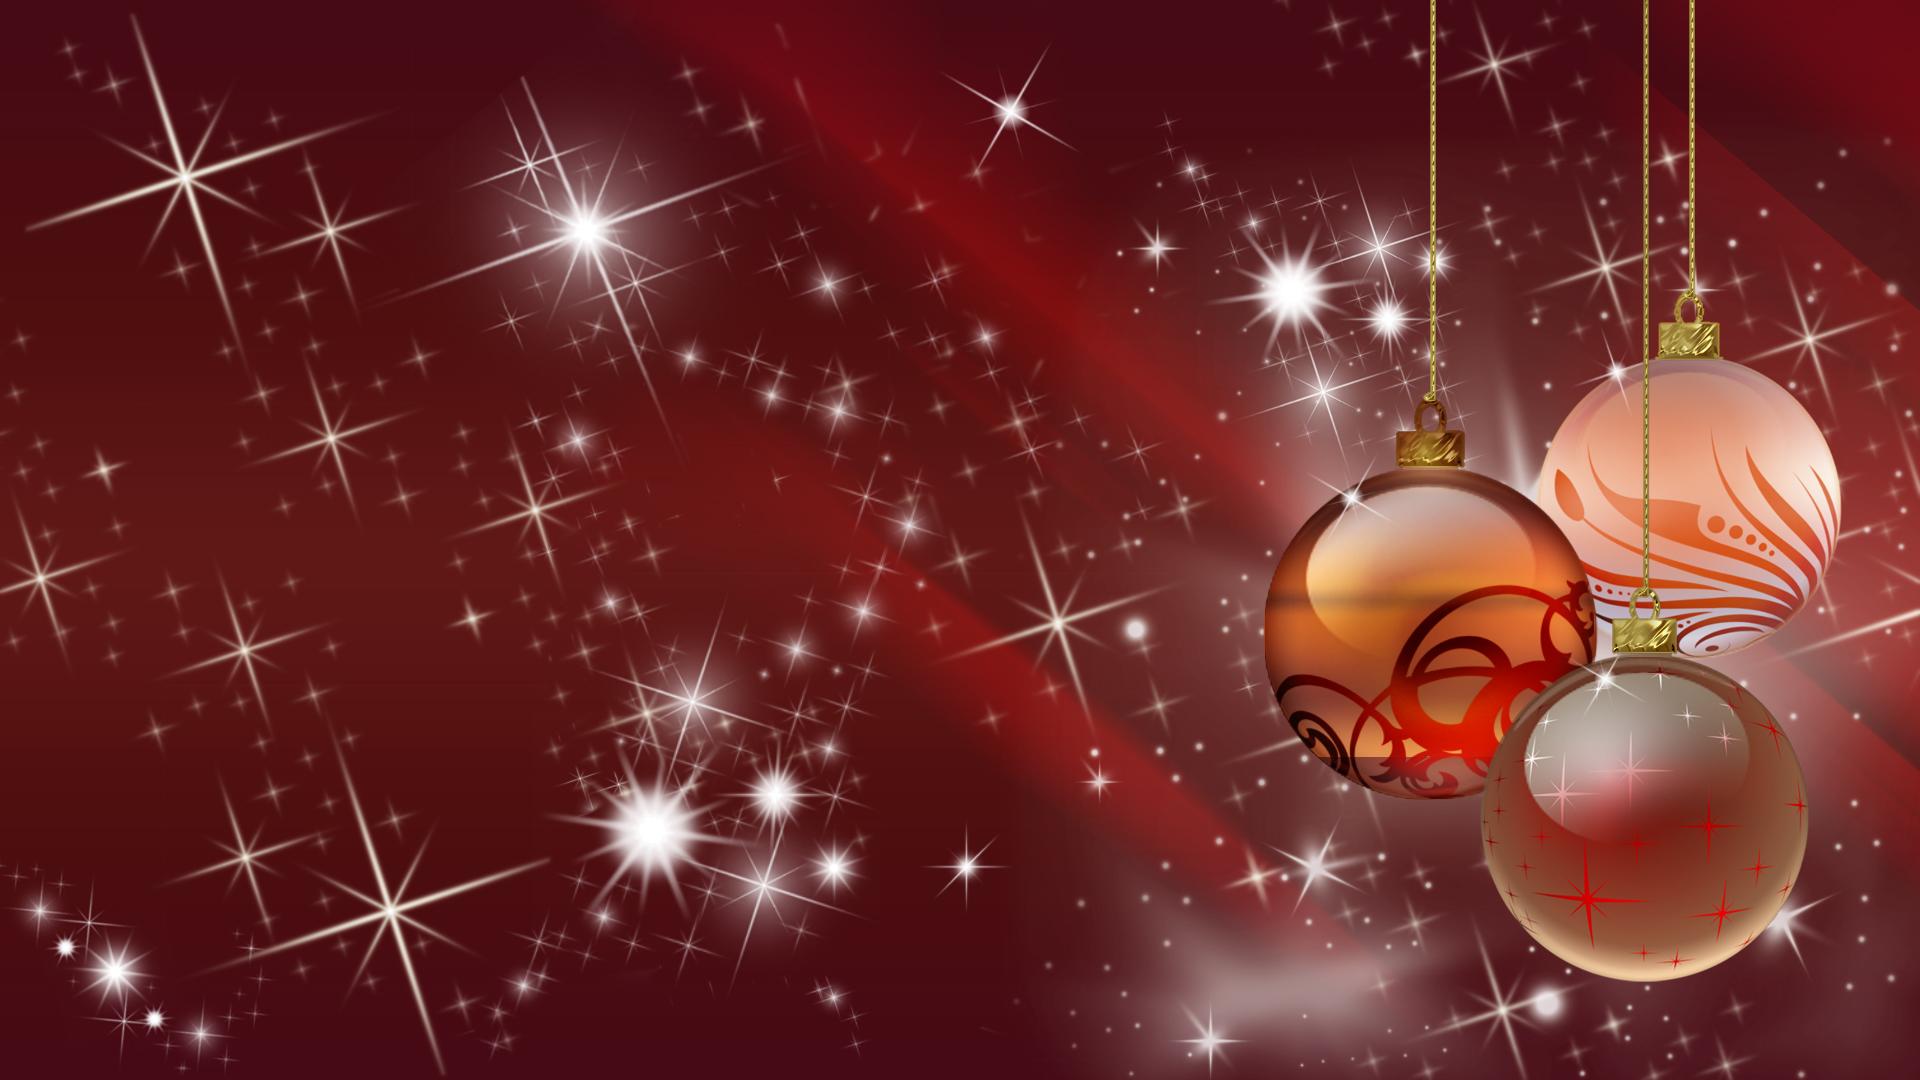 Christmas Background wallpaper   251456 1920x1080